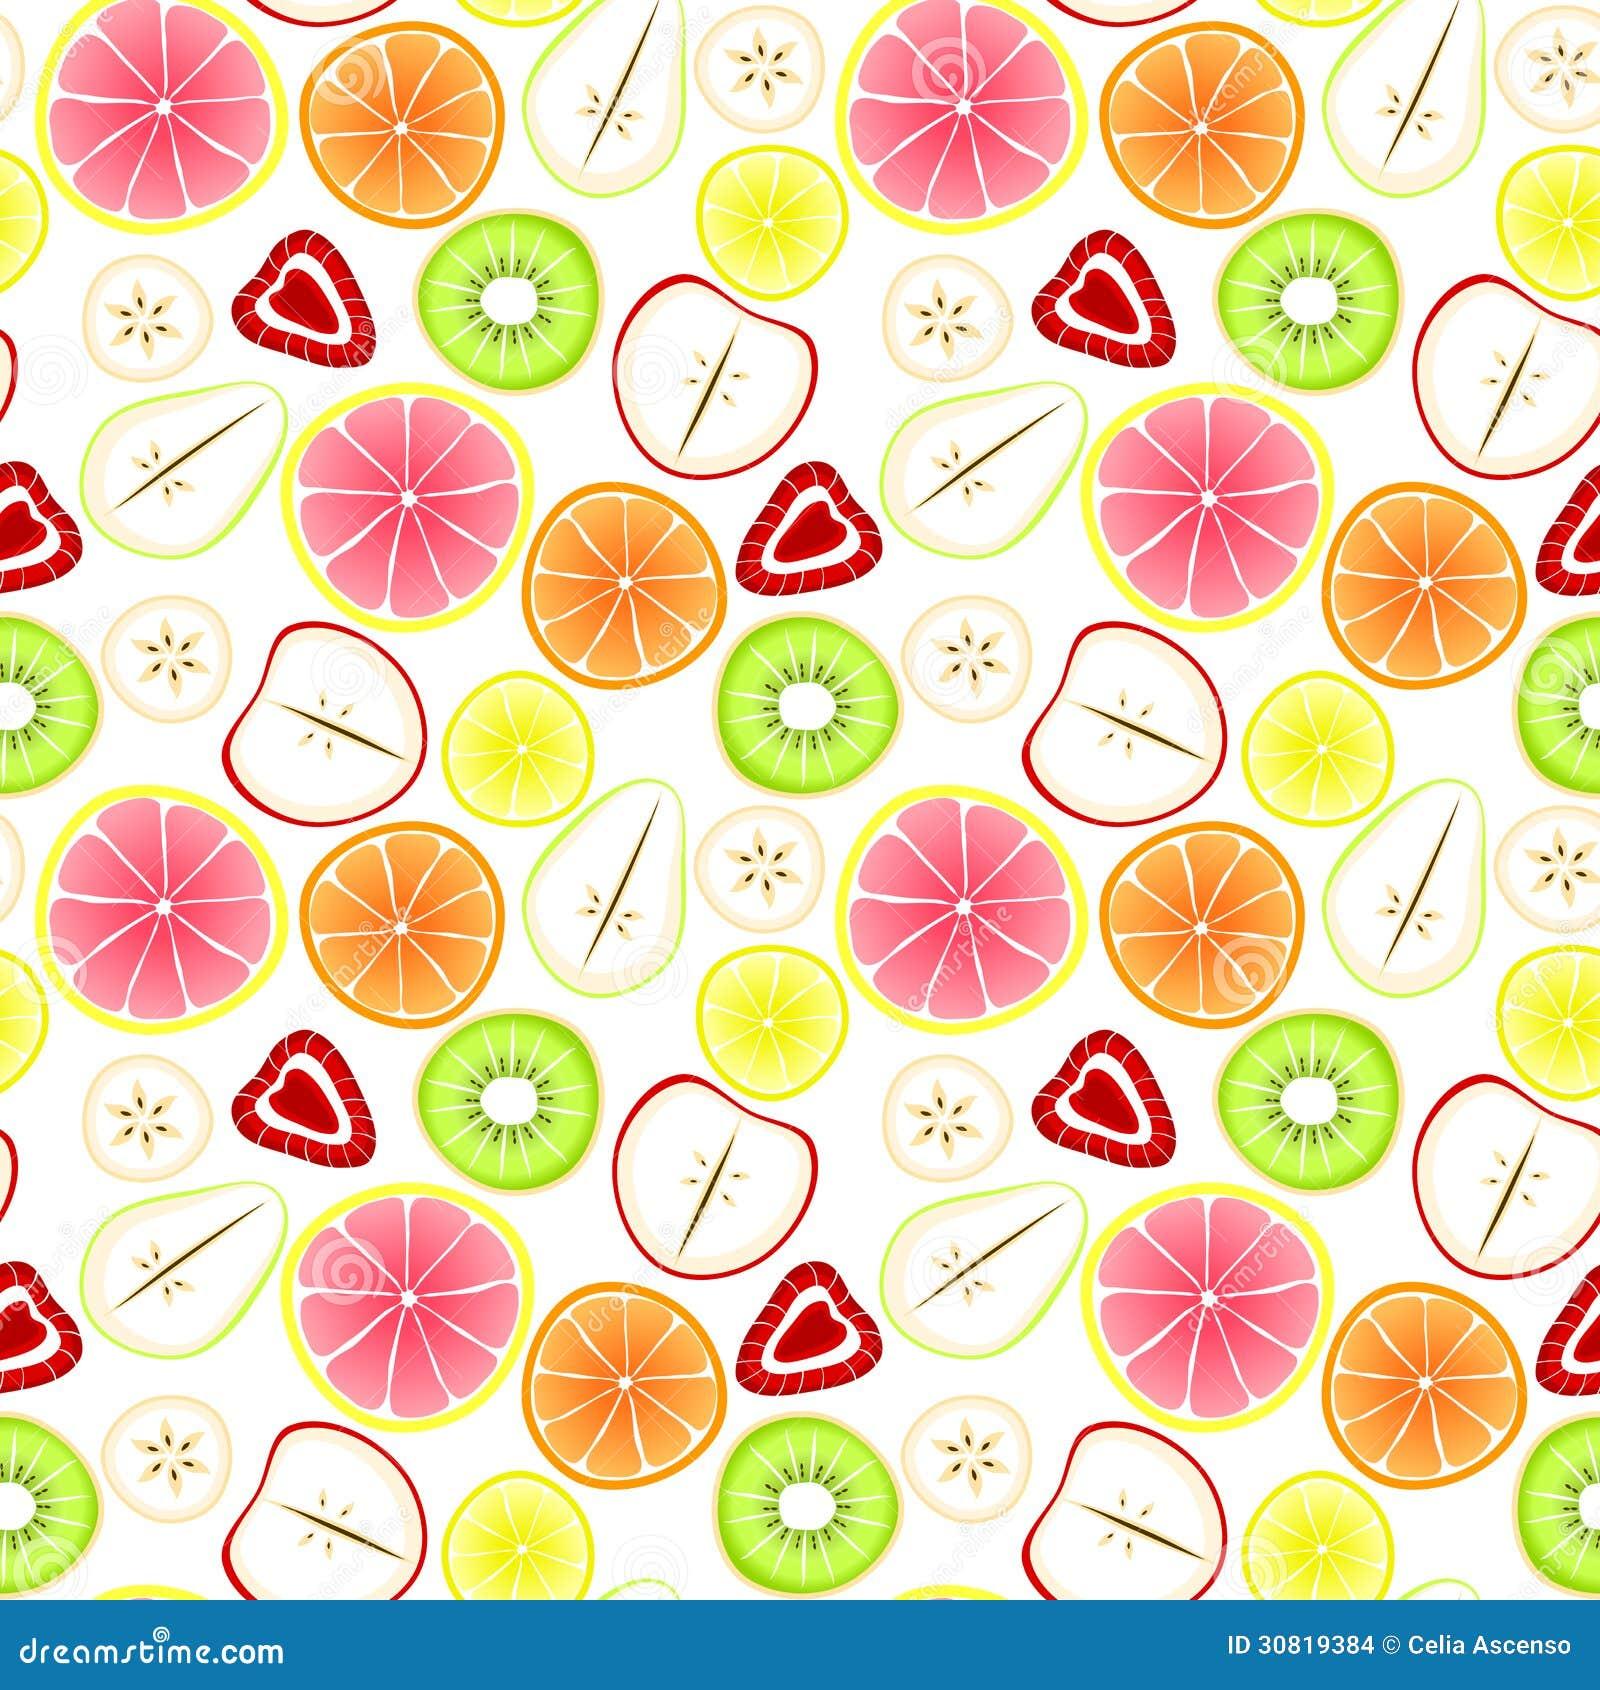 Sliced Fruit Seamless Background Assorted Strawberries Apples Pears Kiwi Bananas Lemons Grapefruit Oranges Tile Natural Fresh Juice Retro